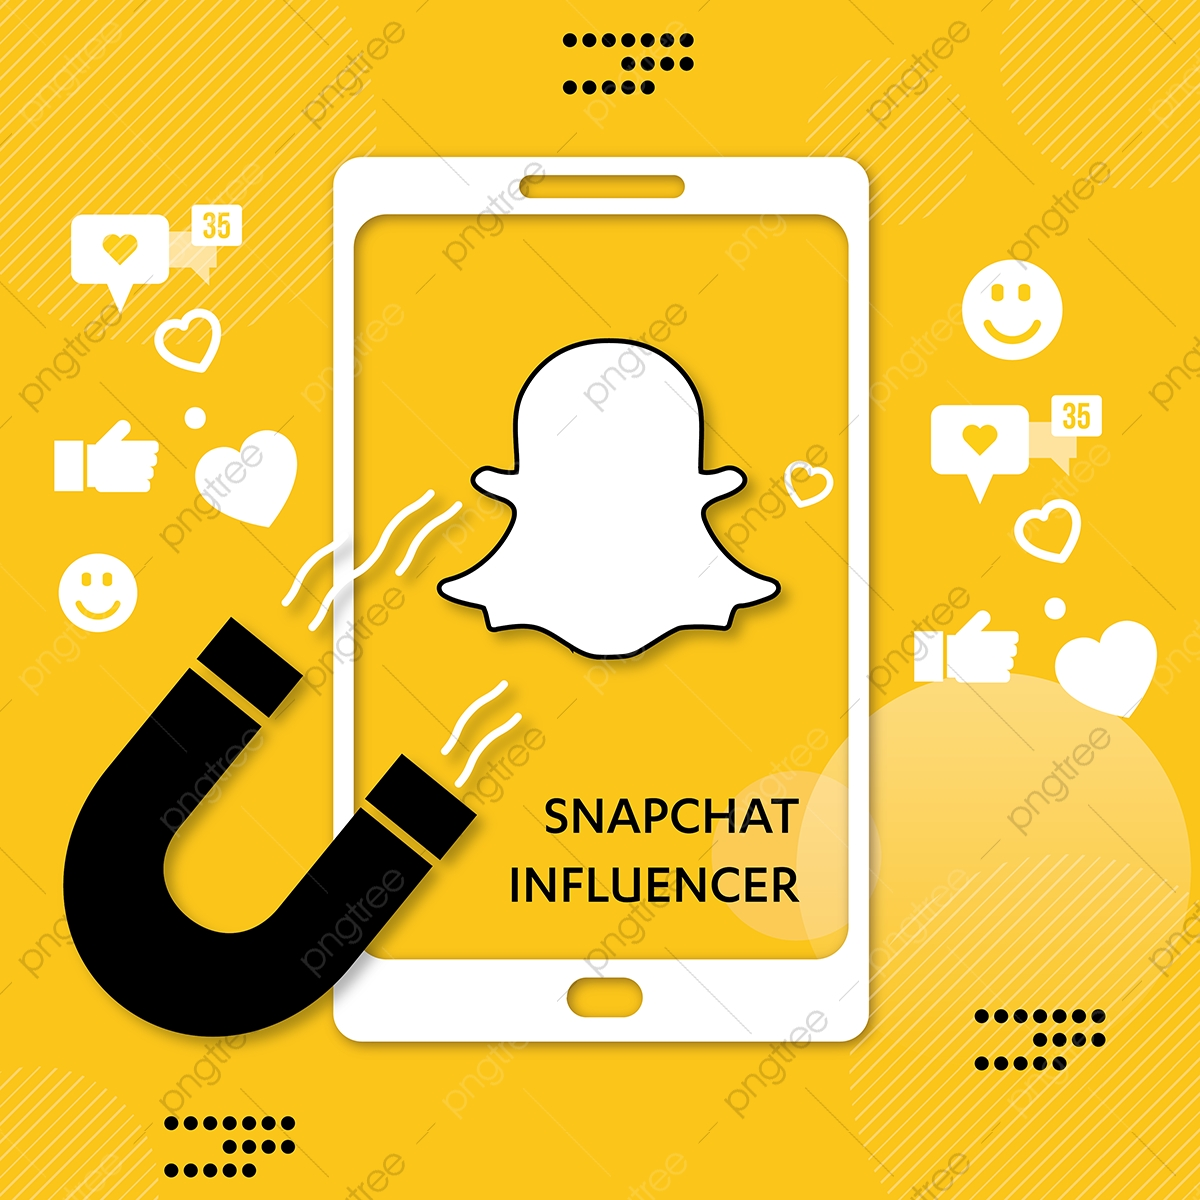 Social Media Background Snapchat Influencer Social Media 1200x1200